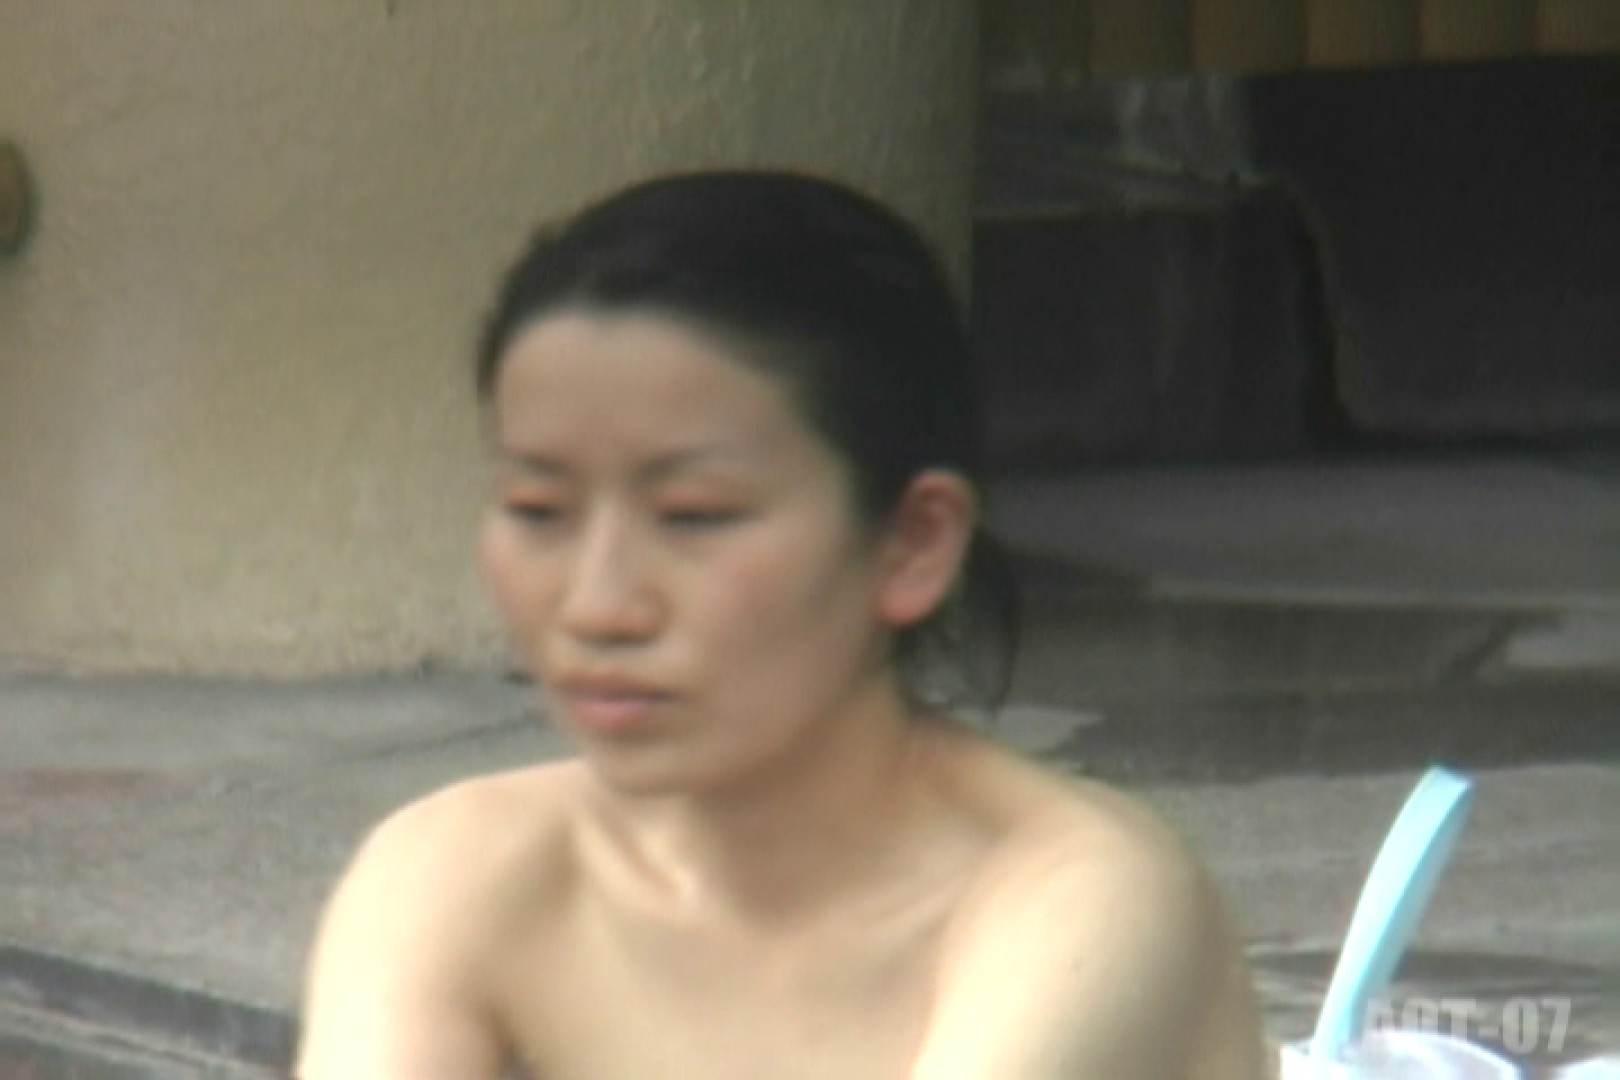 Aquaな露天風呂Vol.769 盗撮師作品 エロ無料画像 71pic 38